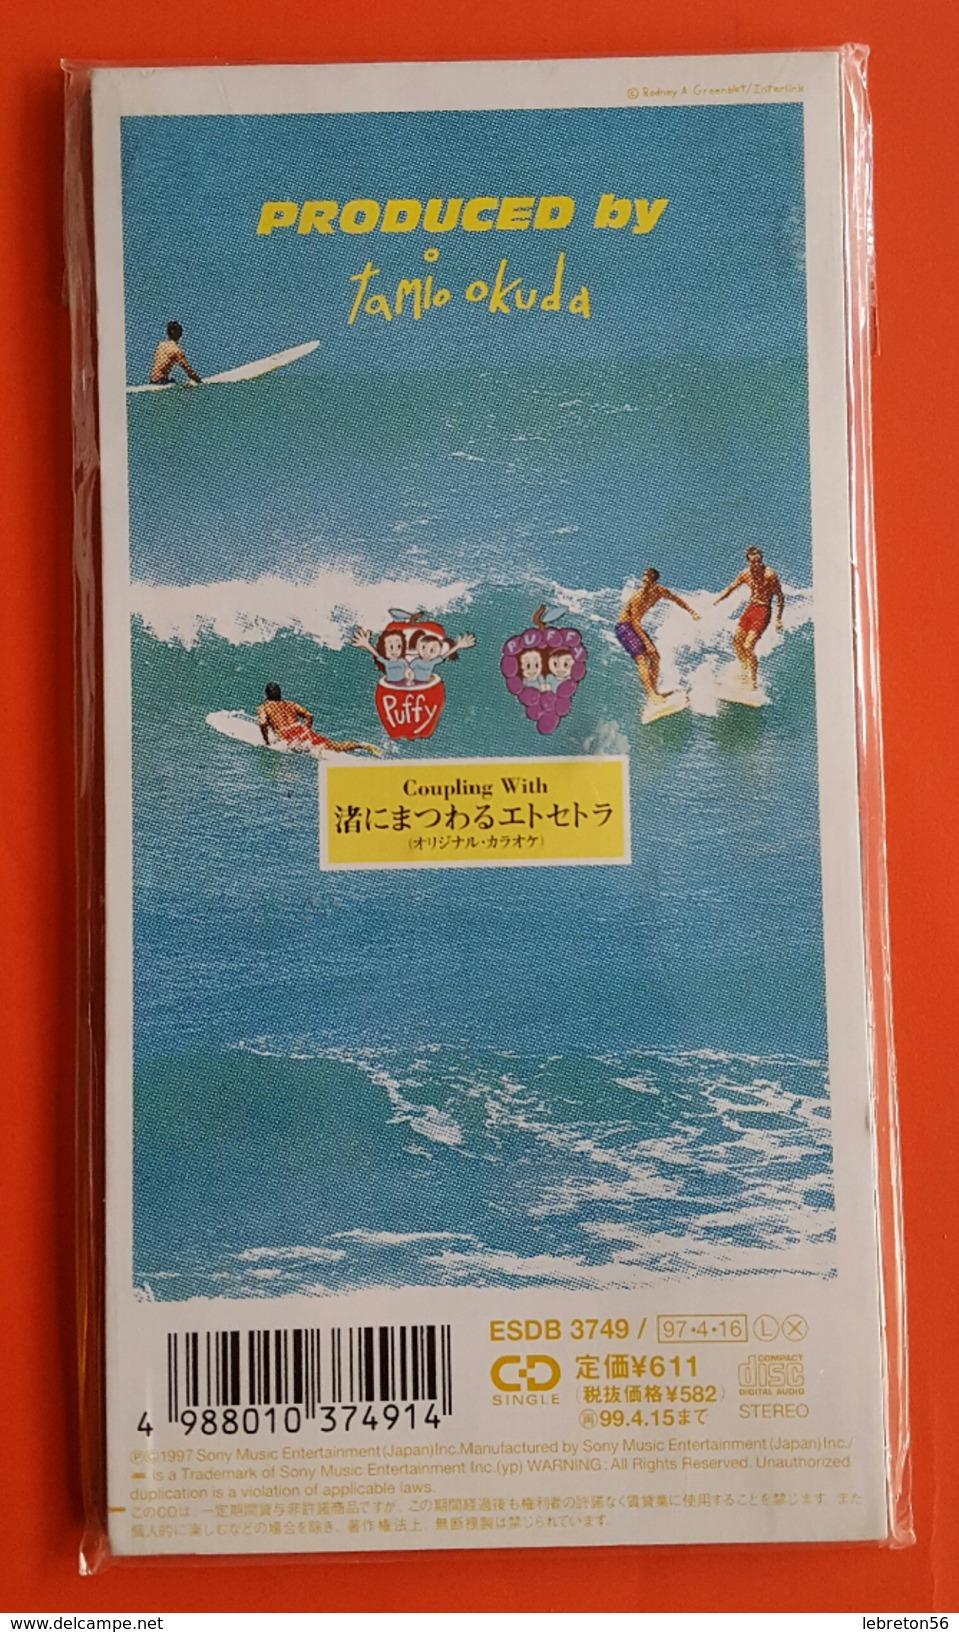 C D Mini Single PUFFY Produit Par Tamio Okuda  Japon - Musik & Instrumente